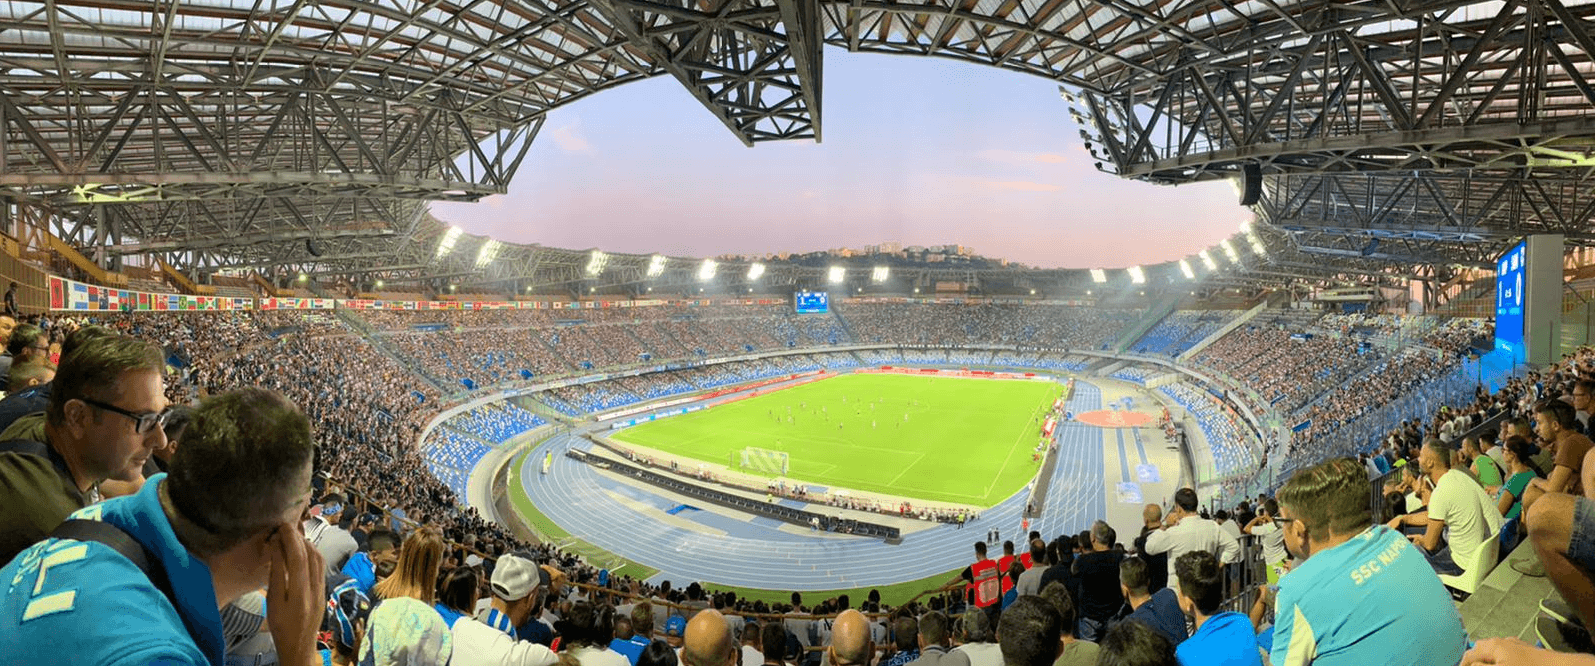 Stadio San Paolo - Stadion-Informationen